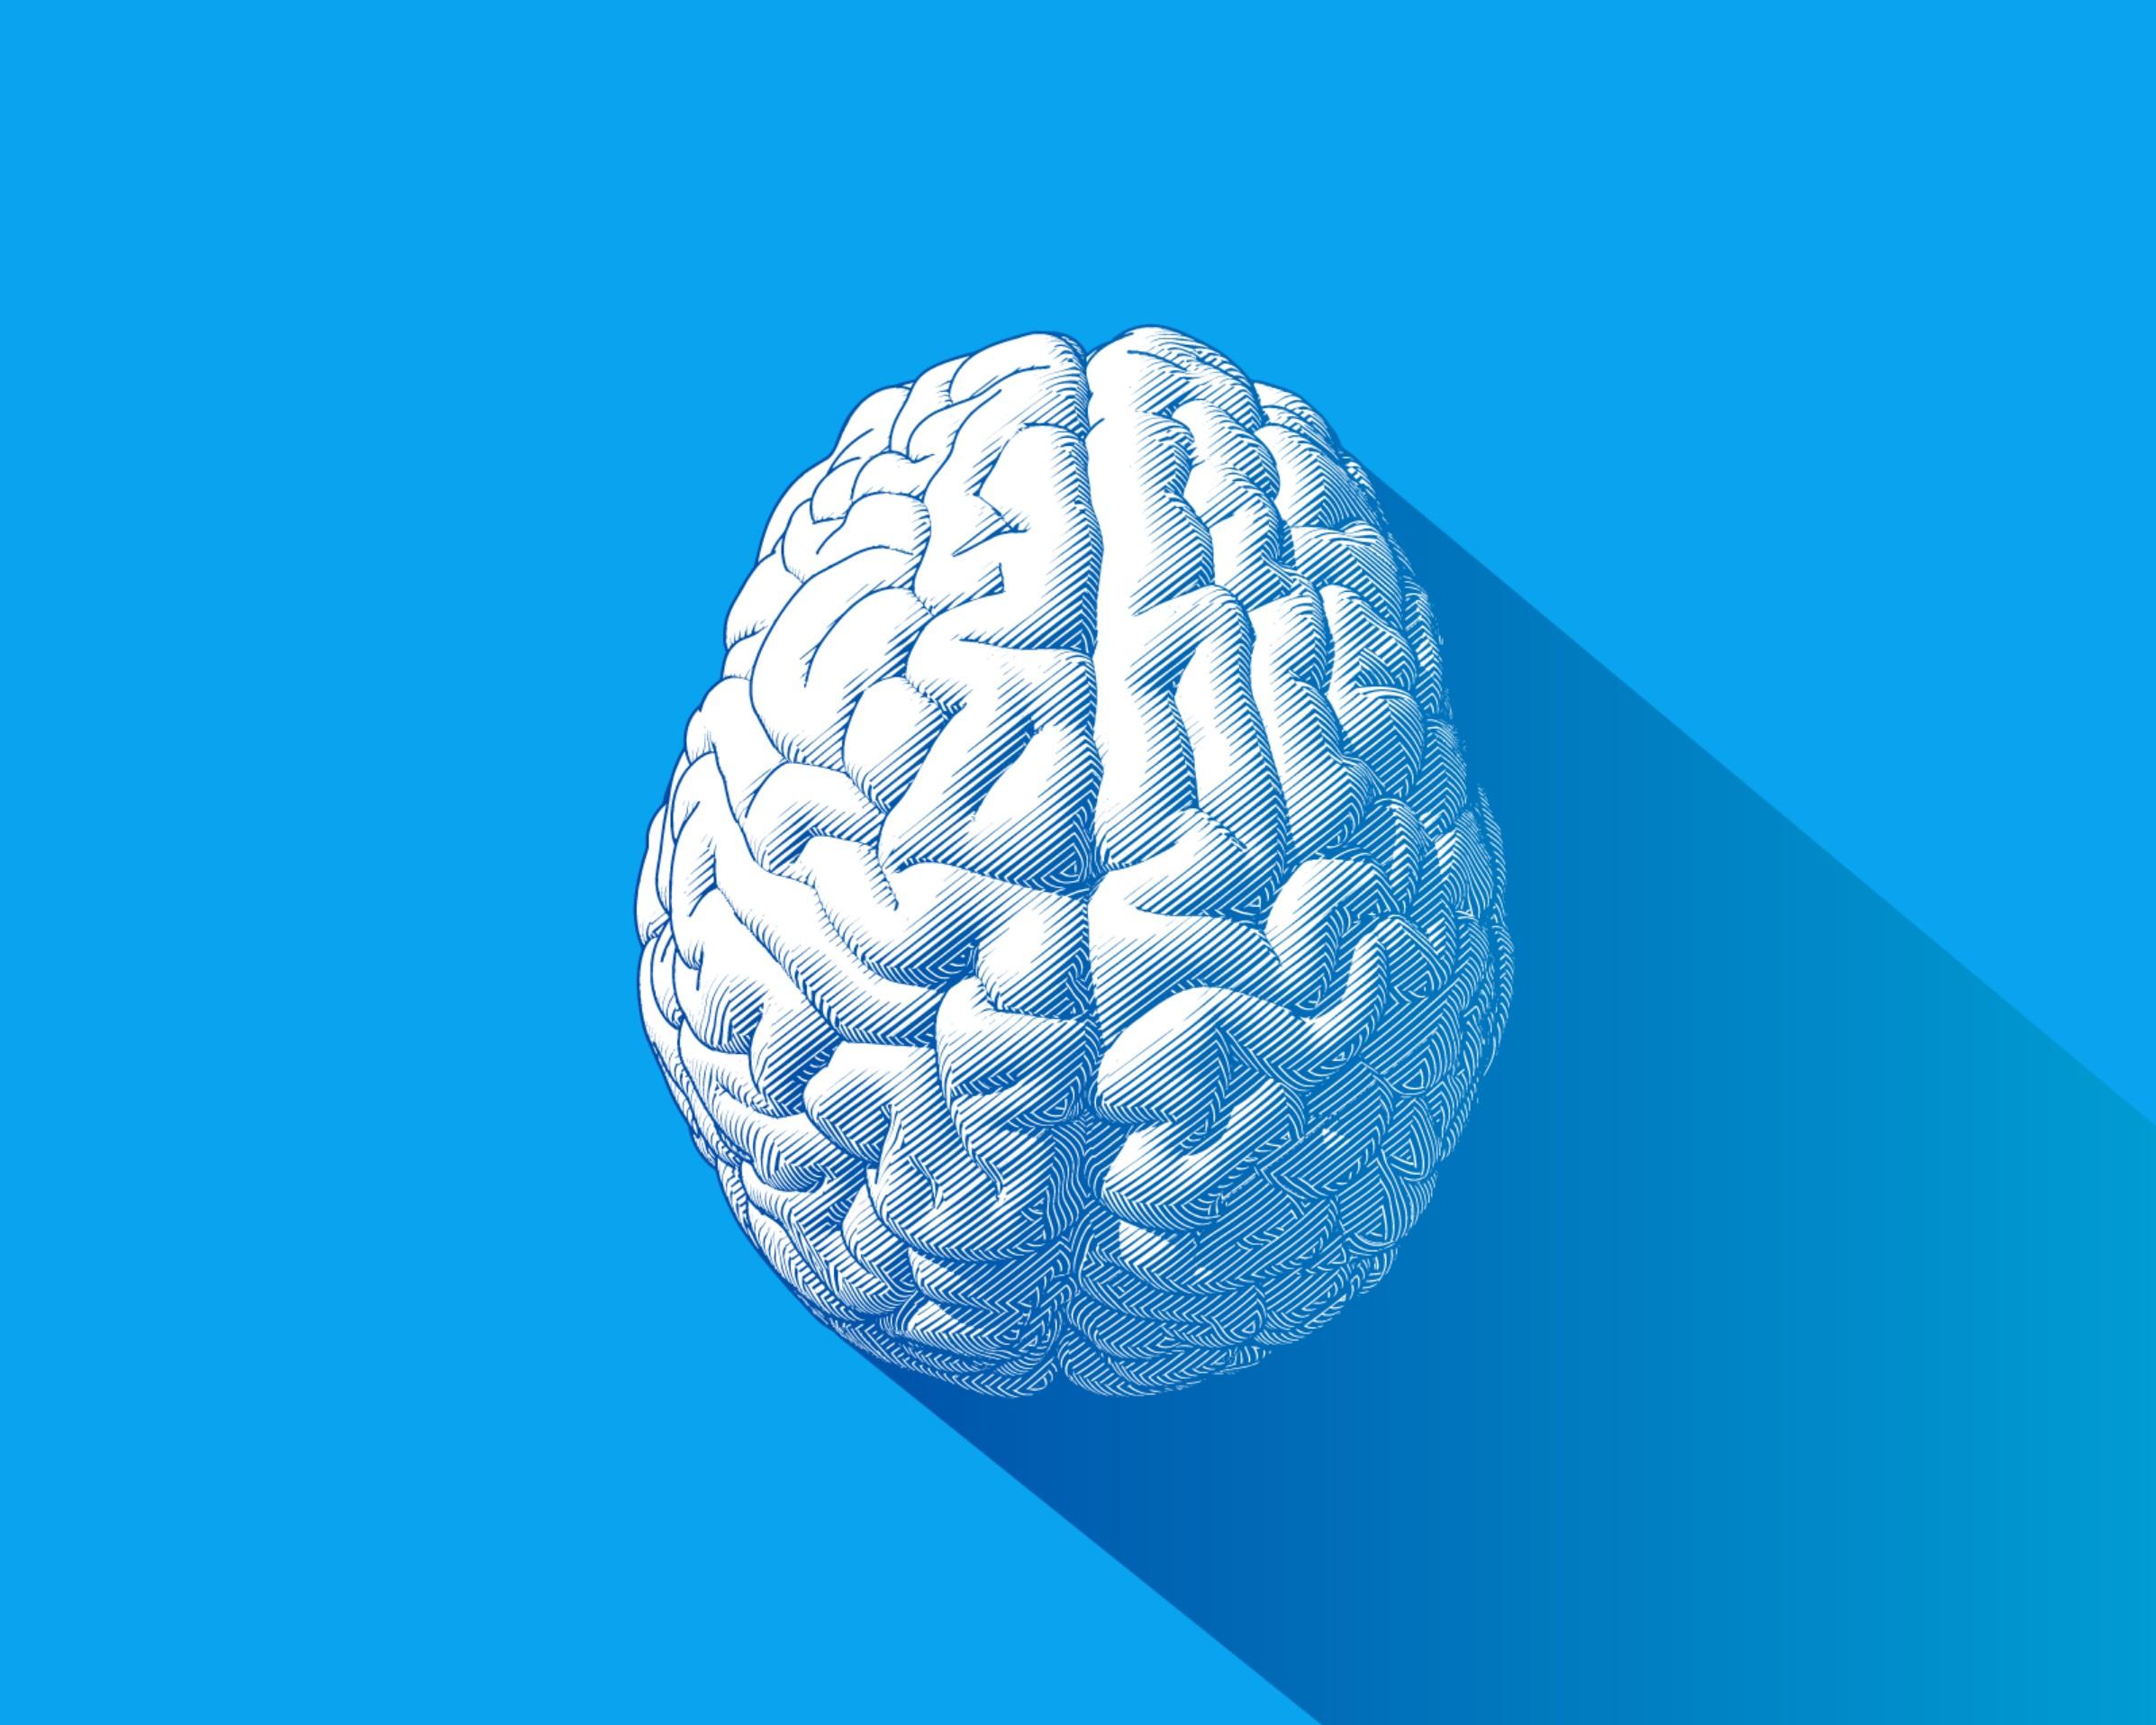 Brain health dementia